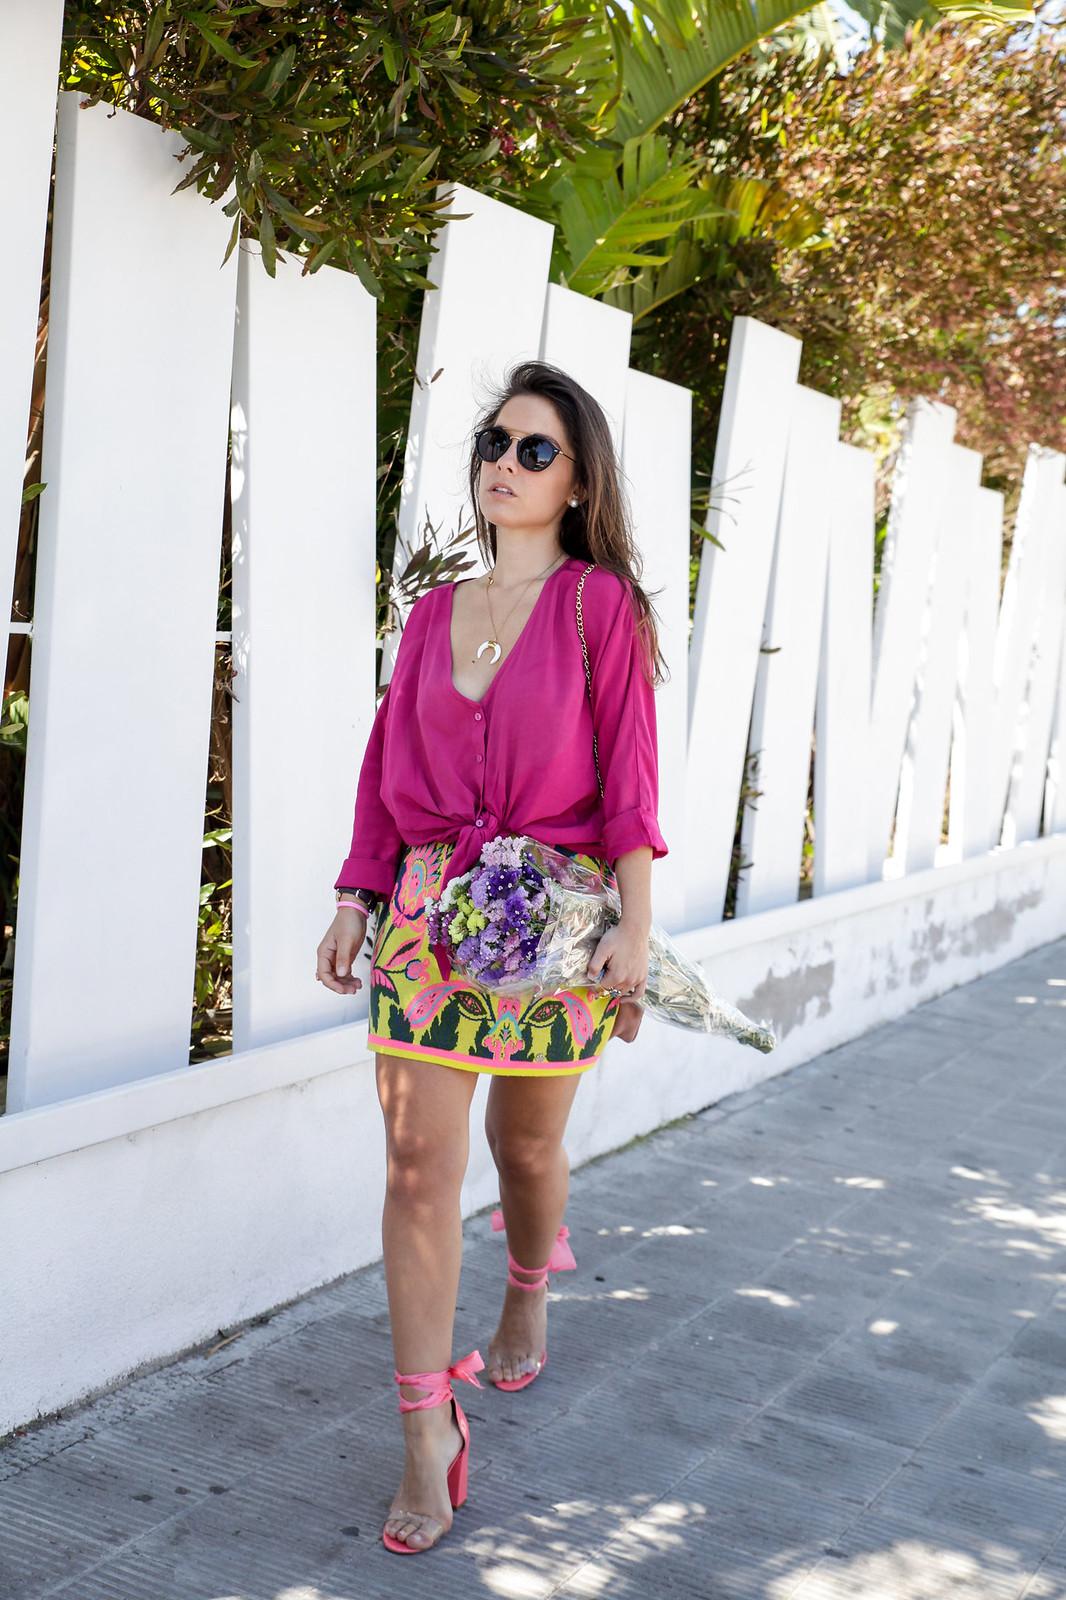 07_blusa_magenta_falda_amarilla_outfit_ruga_summer17_theguestgirl_influencer_barcelona_portugal_brand_ambassador